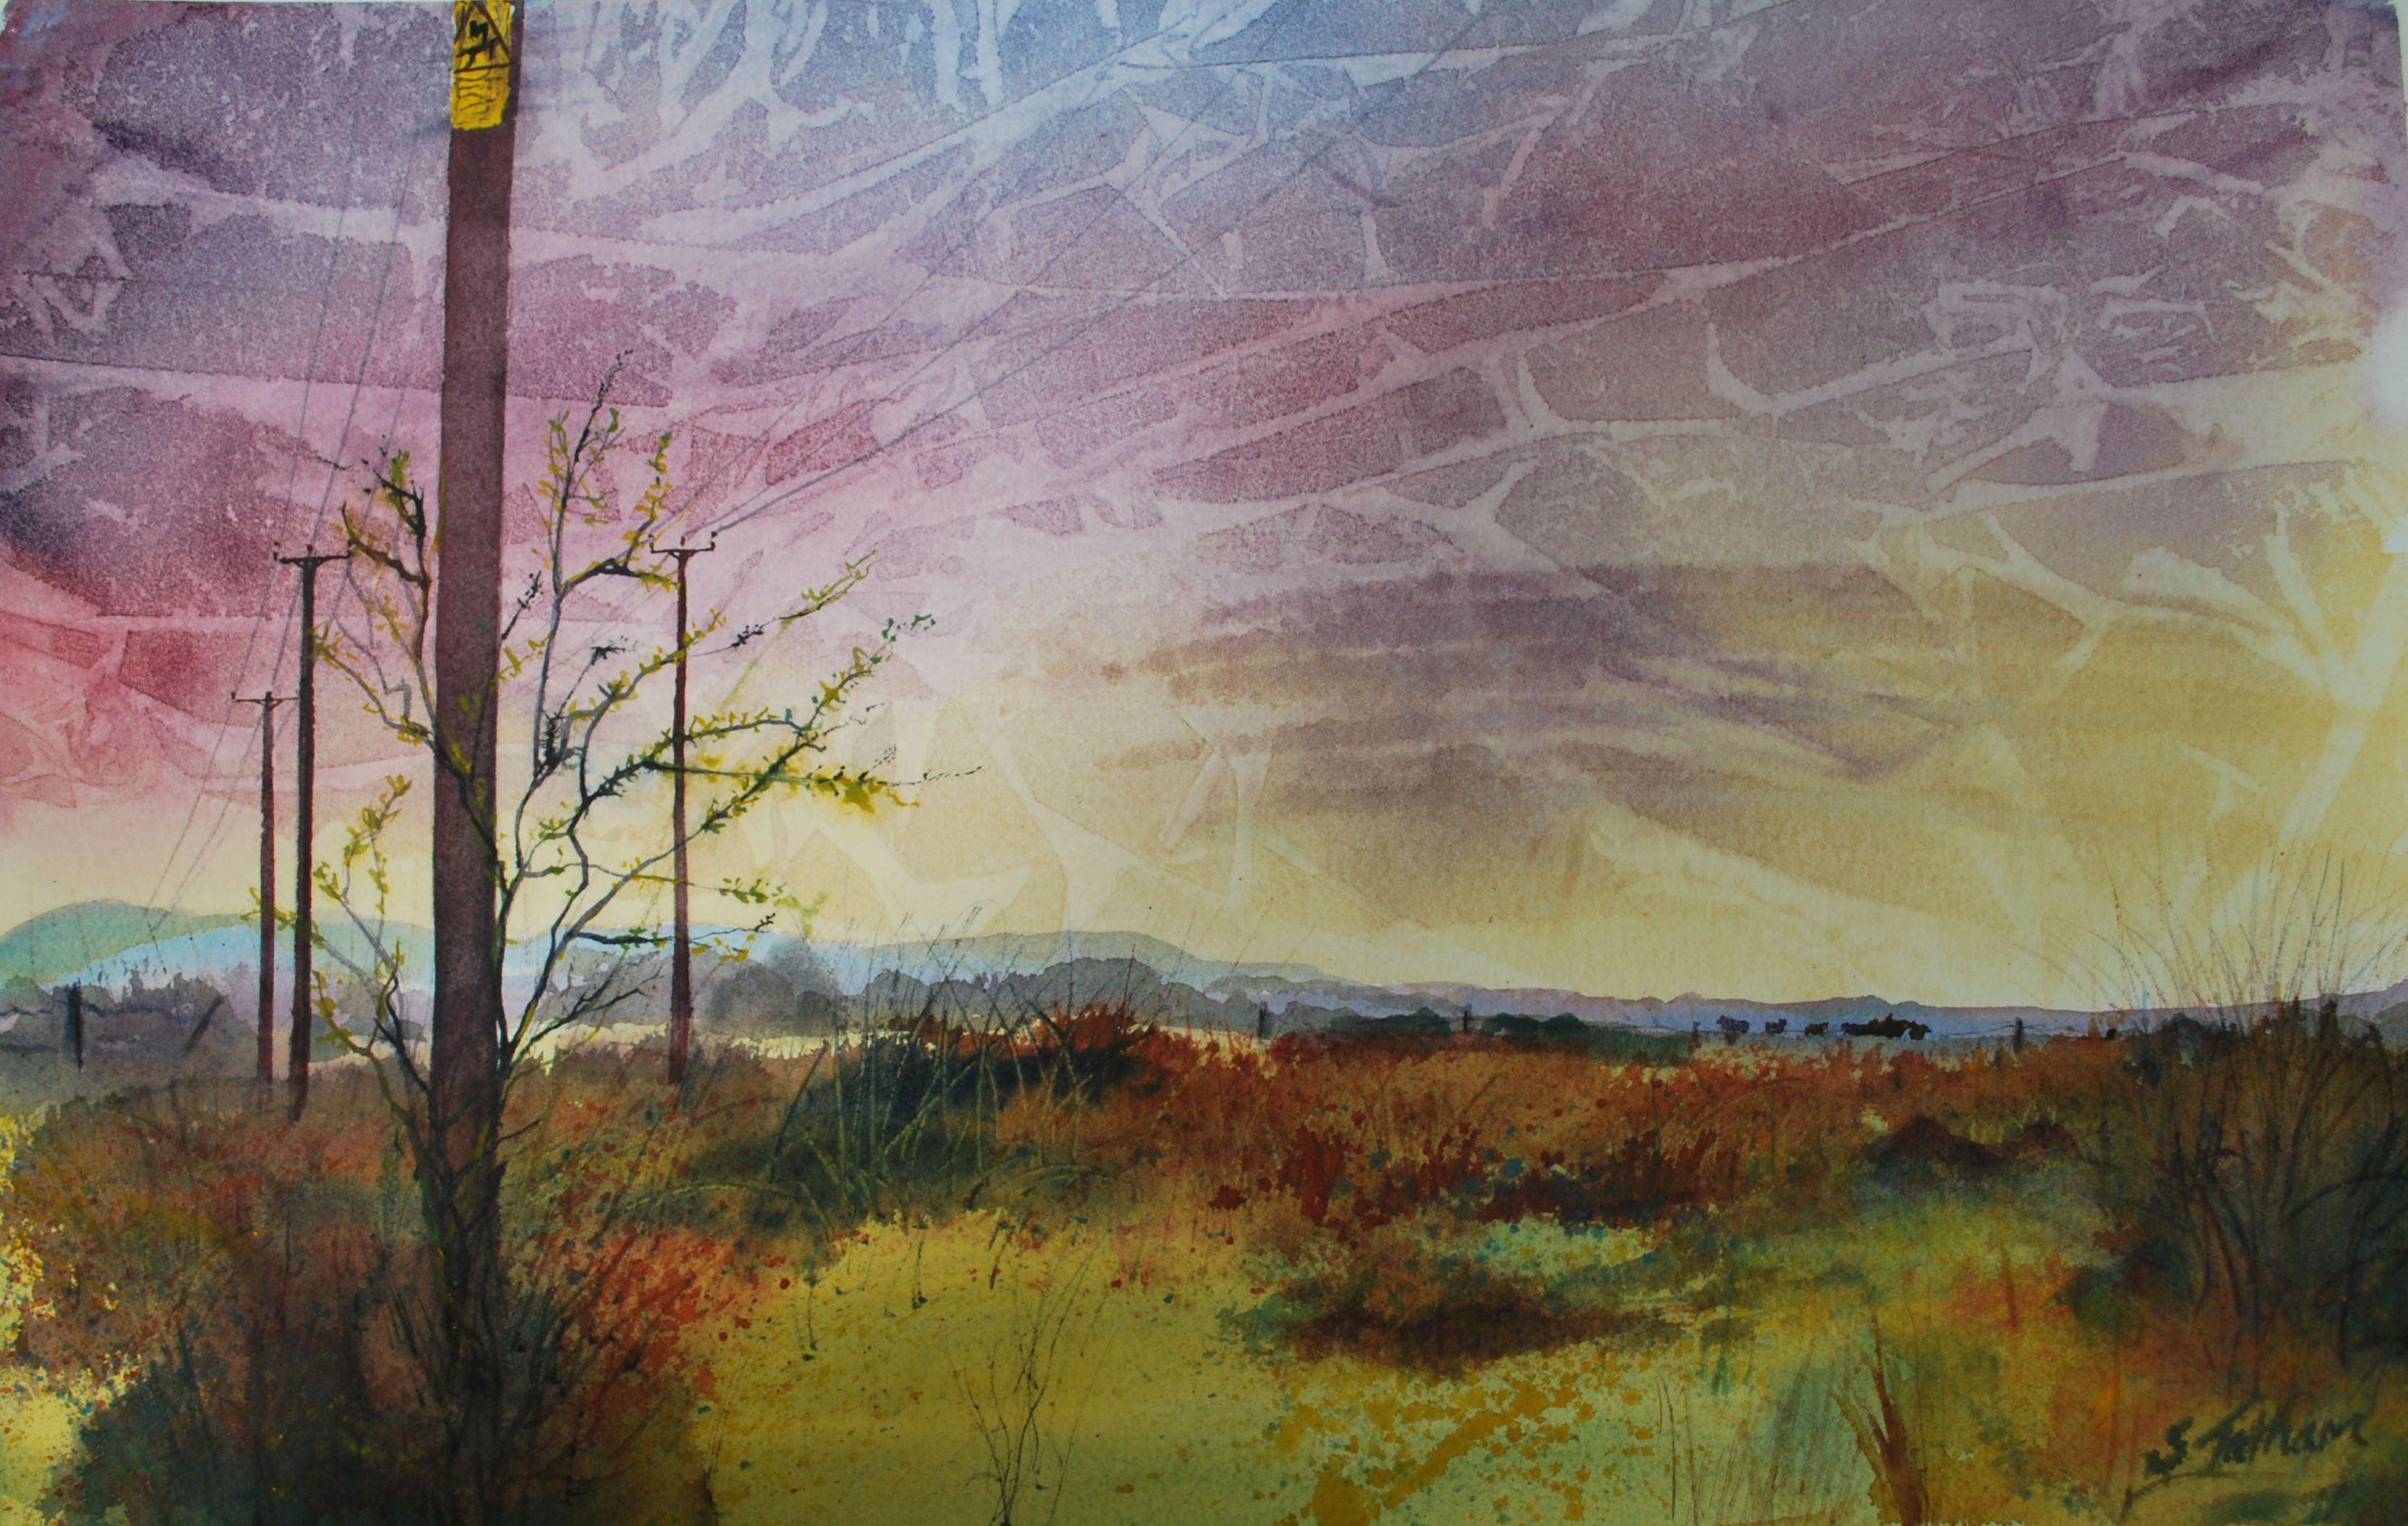 Pevensey Levels Pylons Watercolour by Sonya Tatham